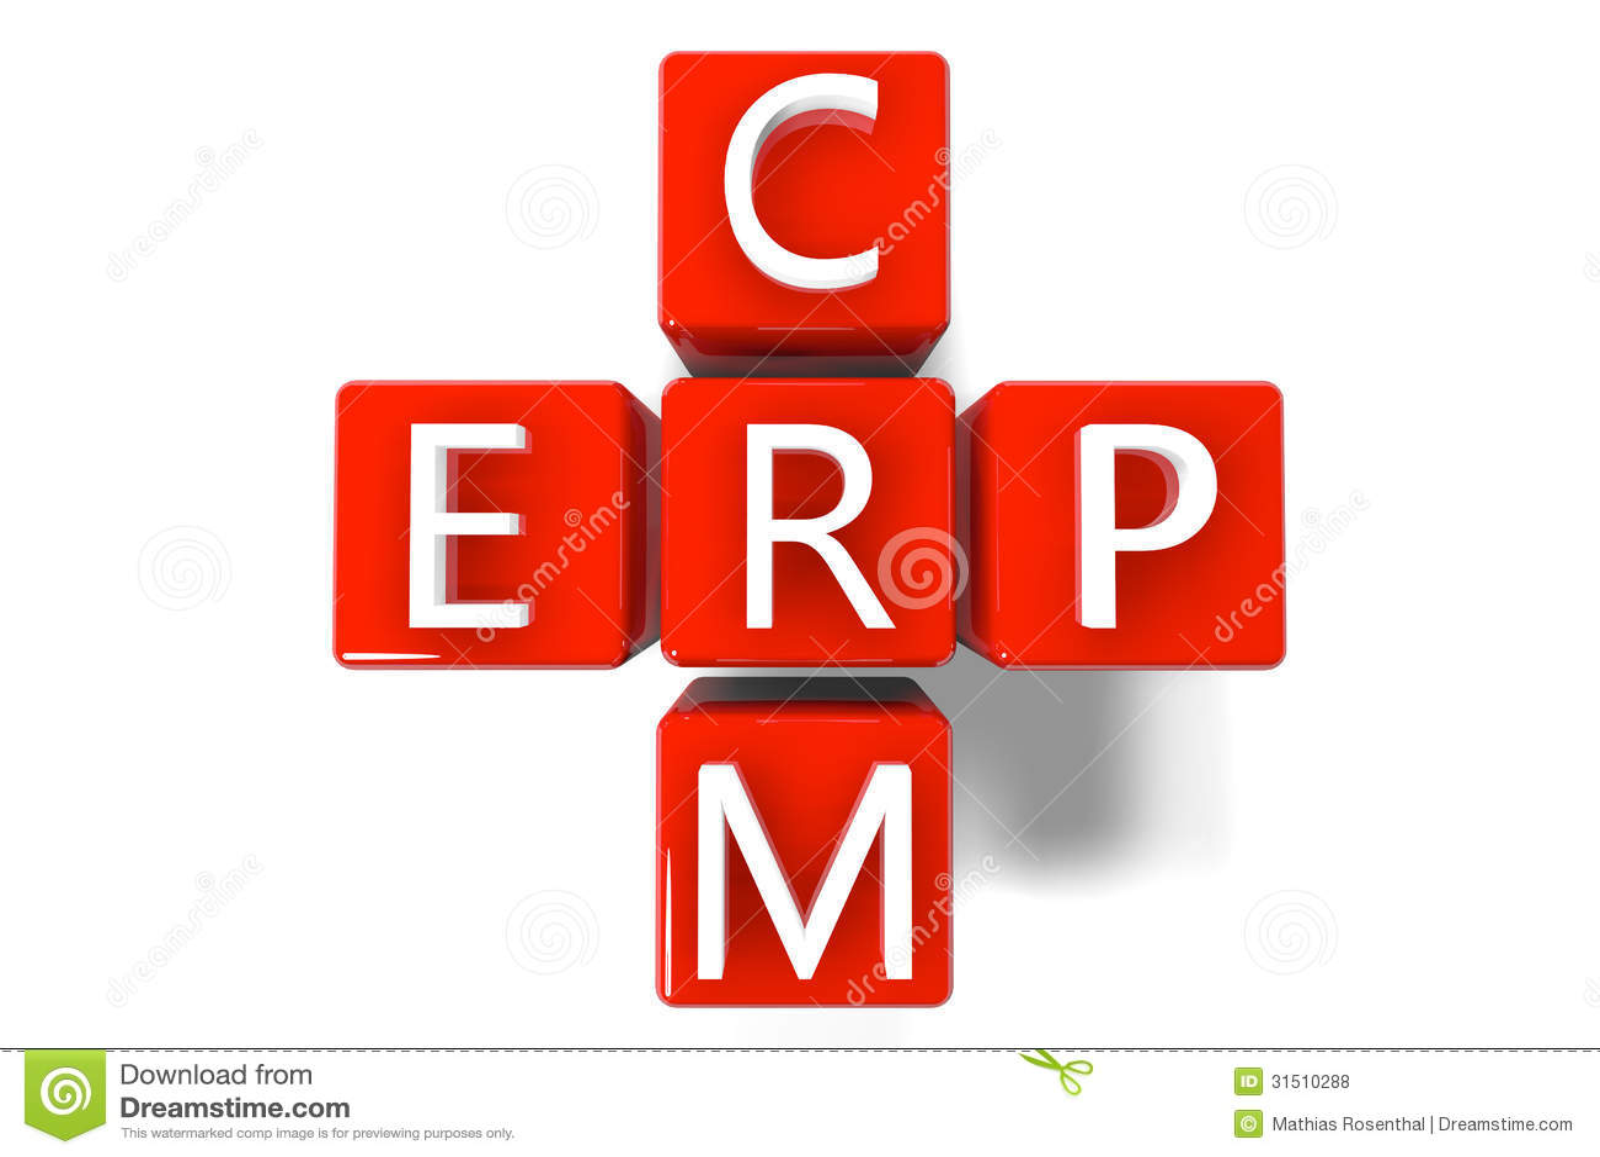 enterprise relationship planning Explore enterprise systems for customer relationship management, supply chain management and enterprise resource planning see how an enterprise information system.